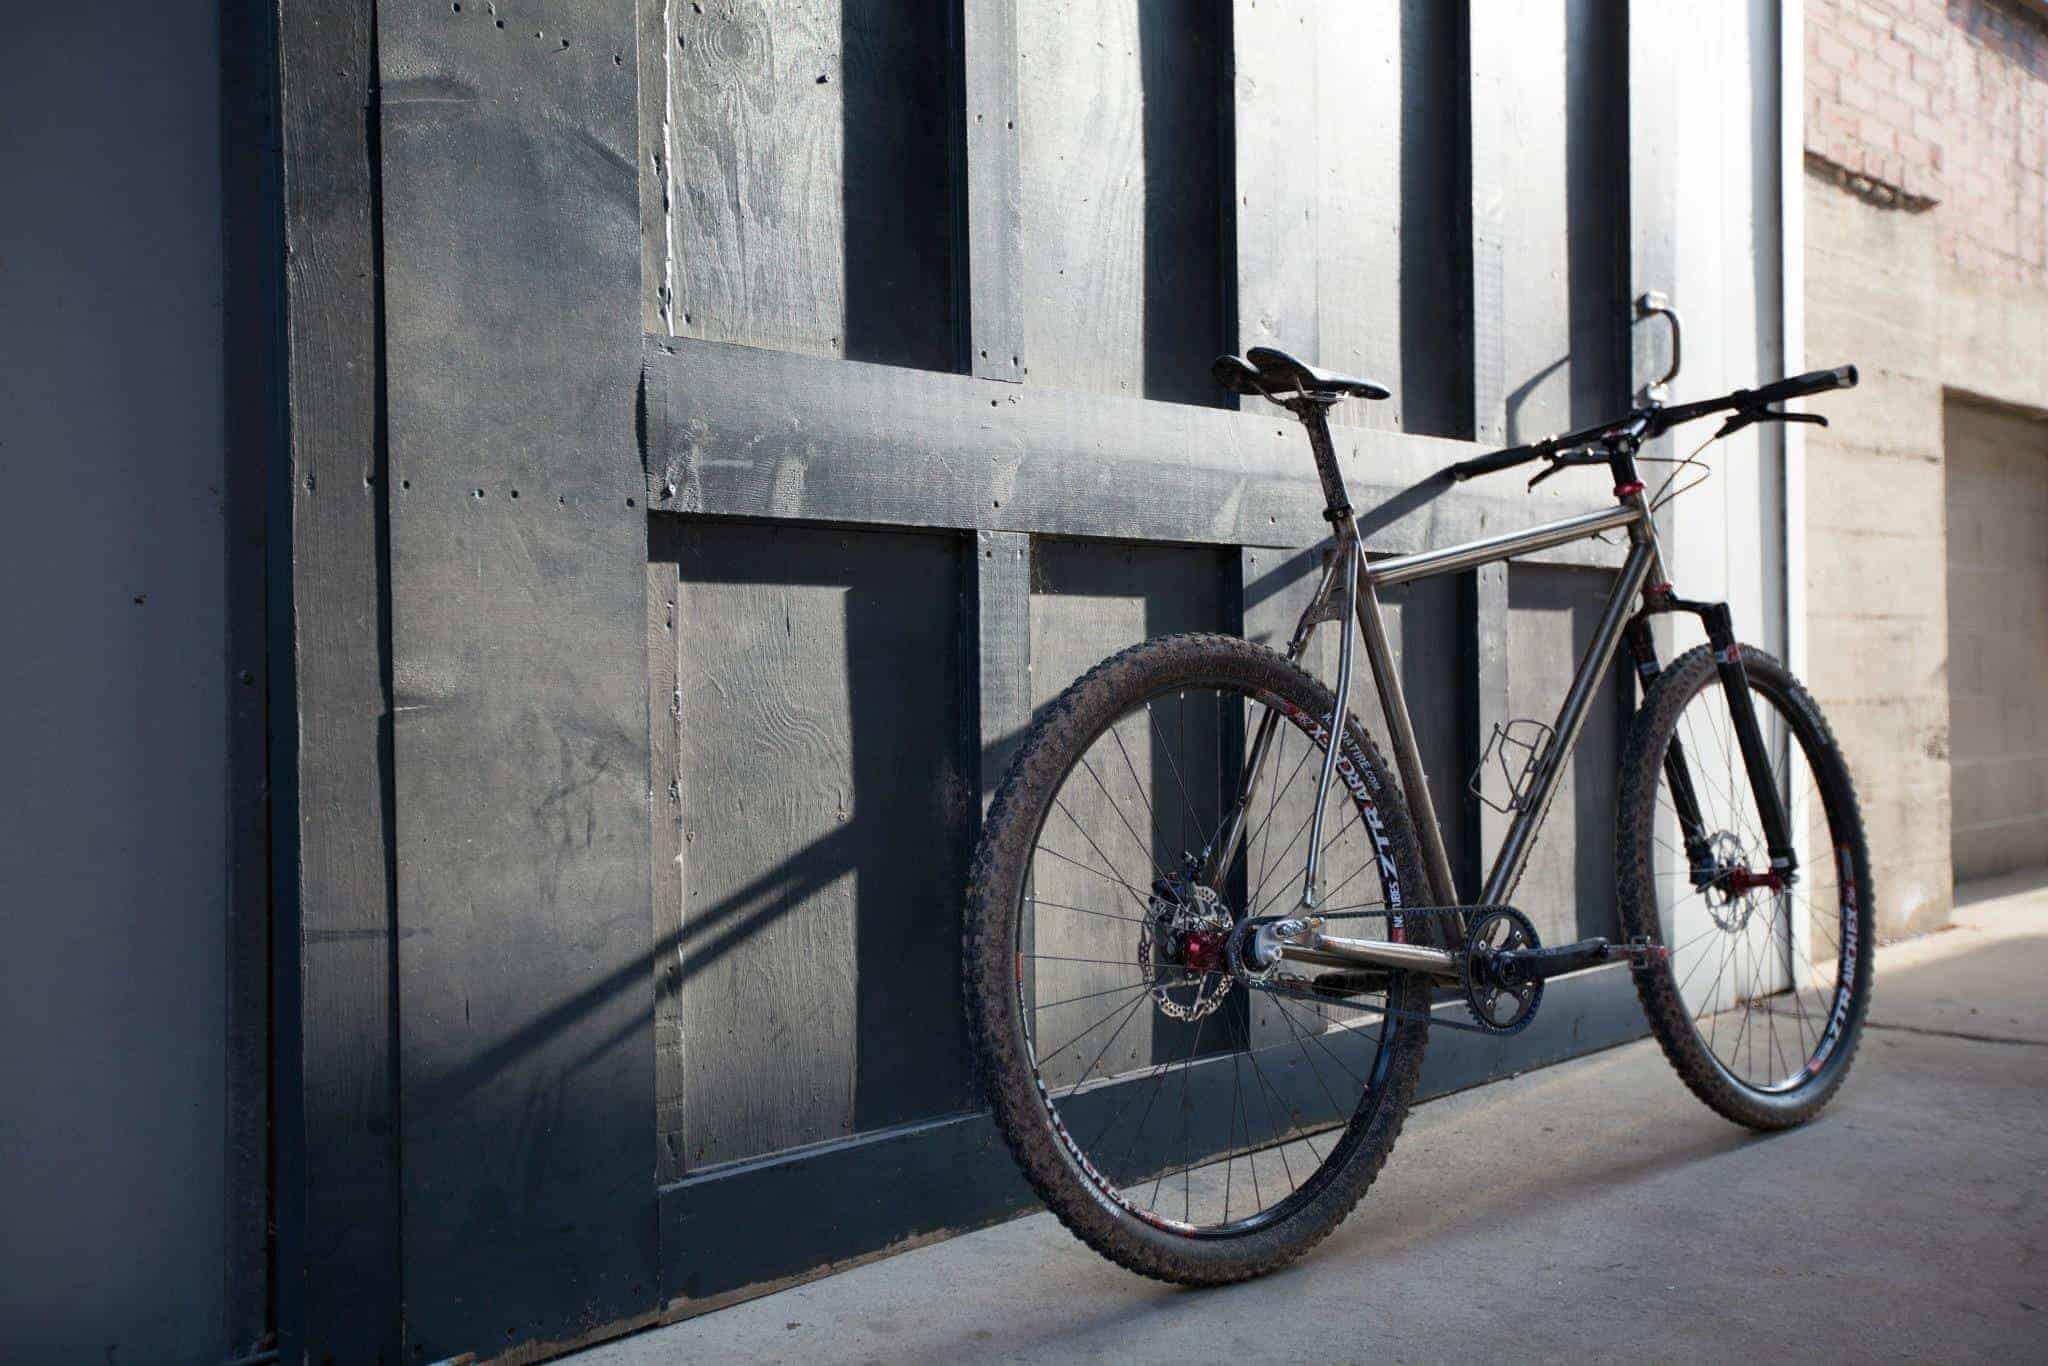 Bike Lust 616 Bicycle Fabrication Gates Belt Drive 29er